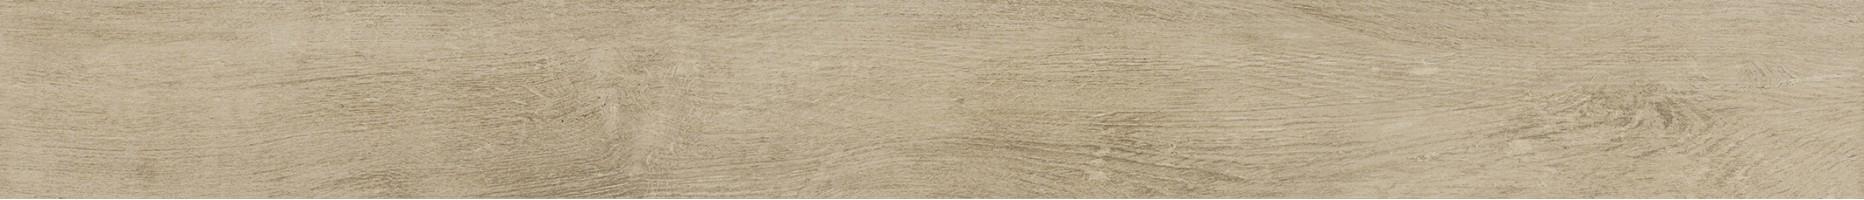 Керамогранит Porcelanosa Manhattan Maple Antislip 19.3x180 P1670023